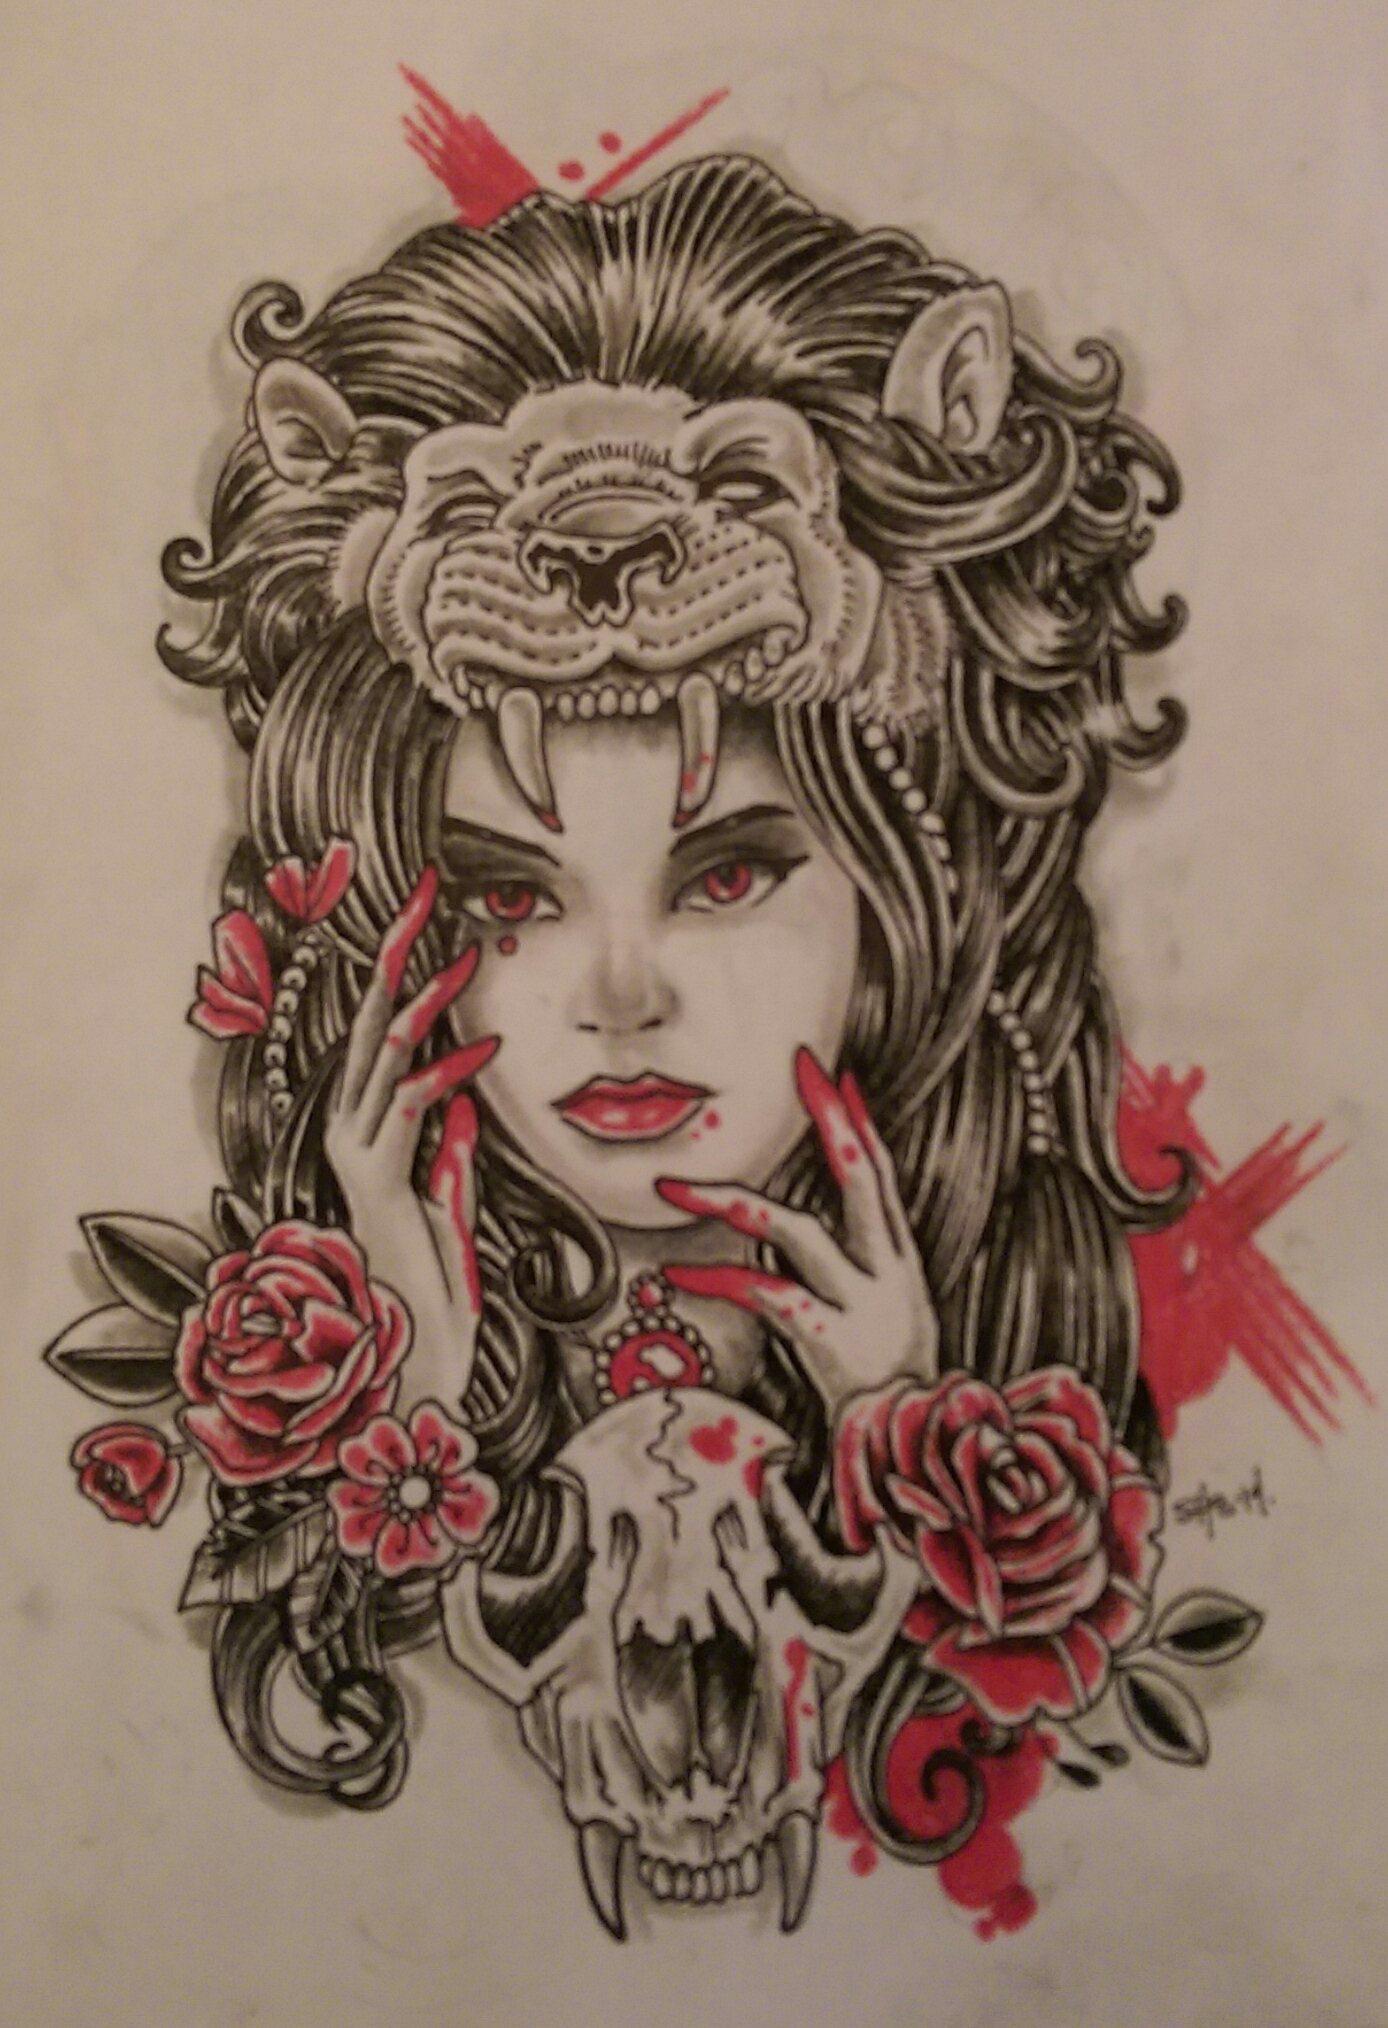 Longmont_tattoo_Artist_Skinhouse_leo